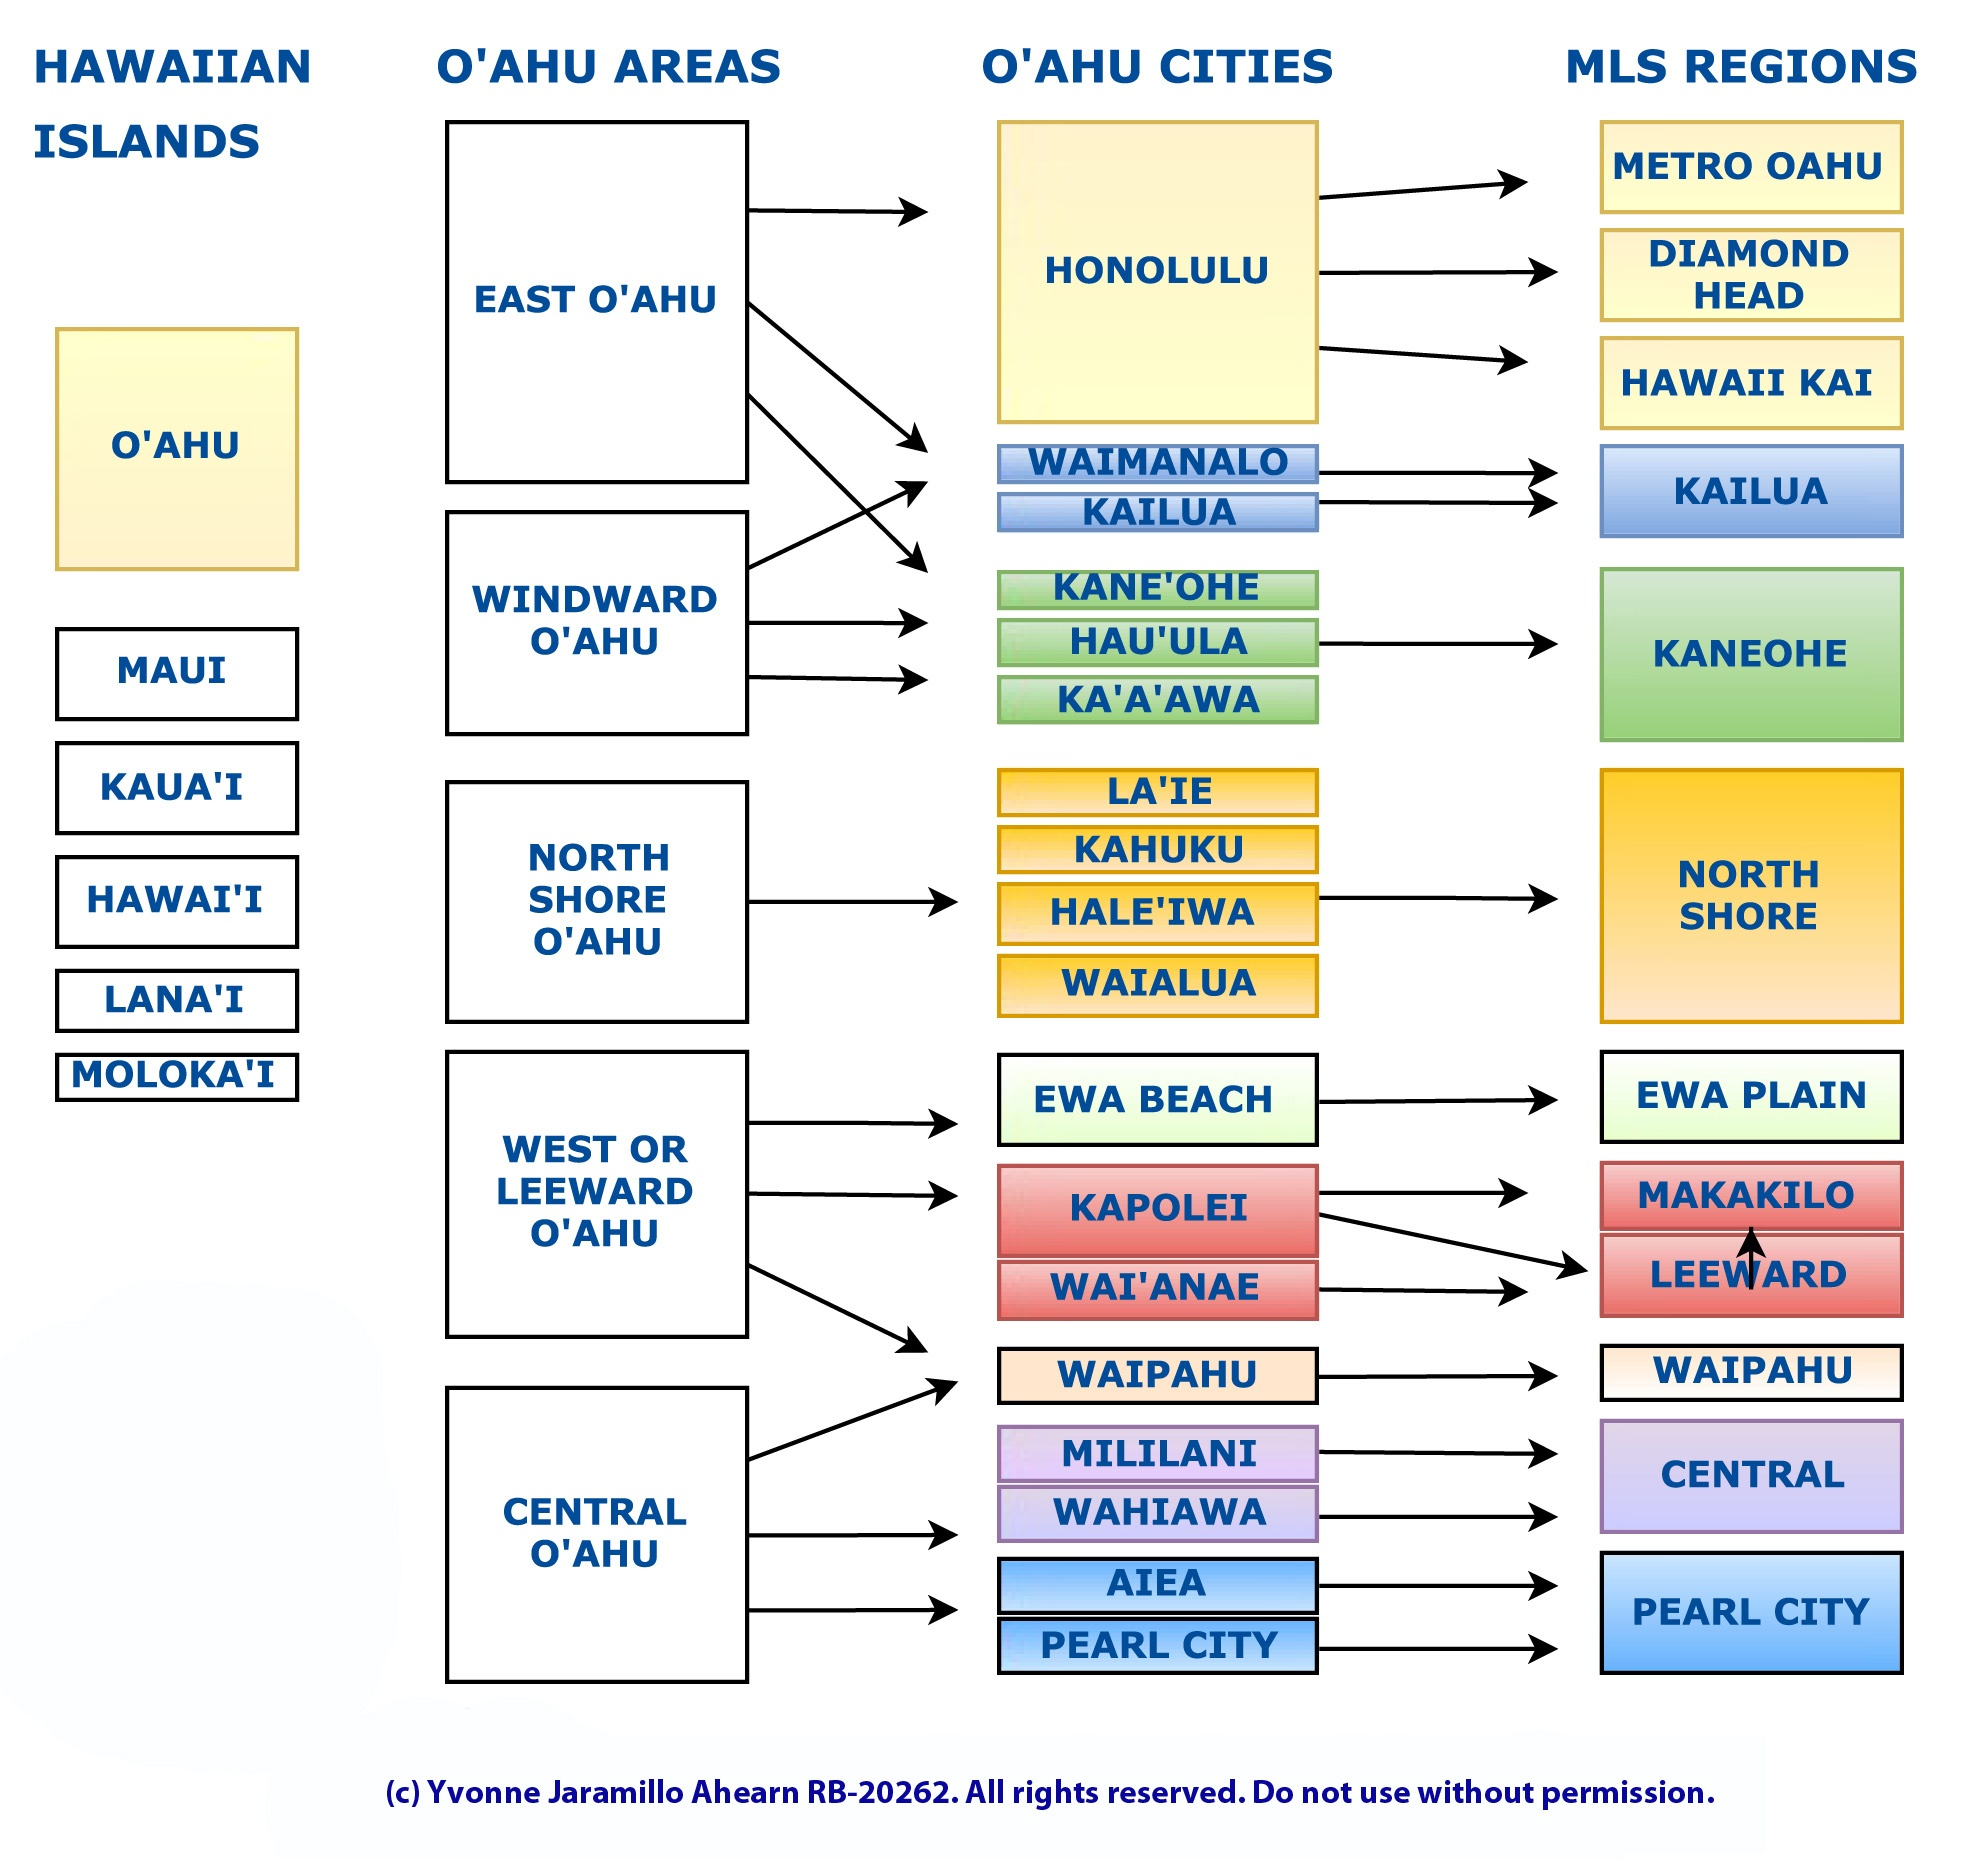 Neighborhoods on Oahu - Oahu MLS Regions, Oahu Areas, & Oahu Towns